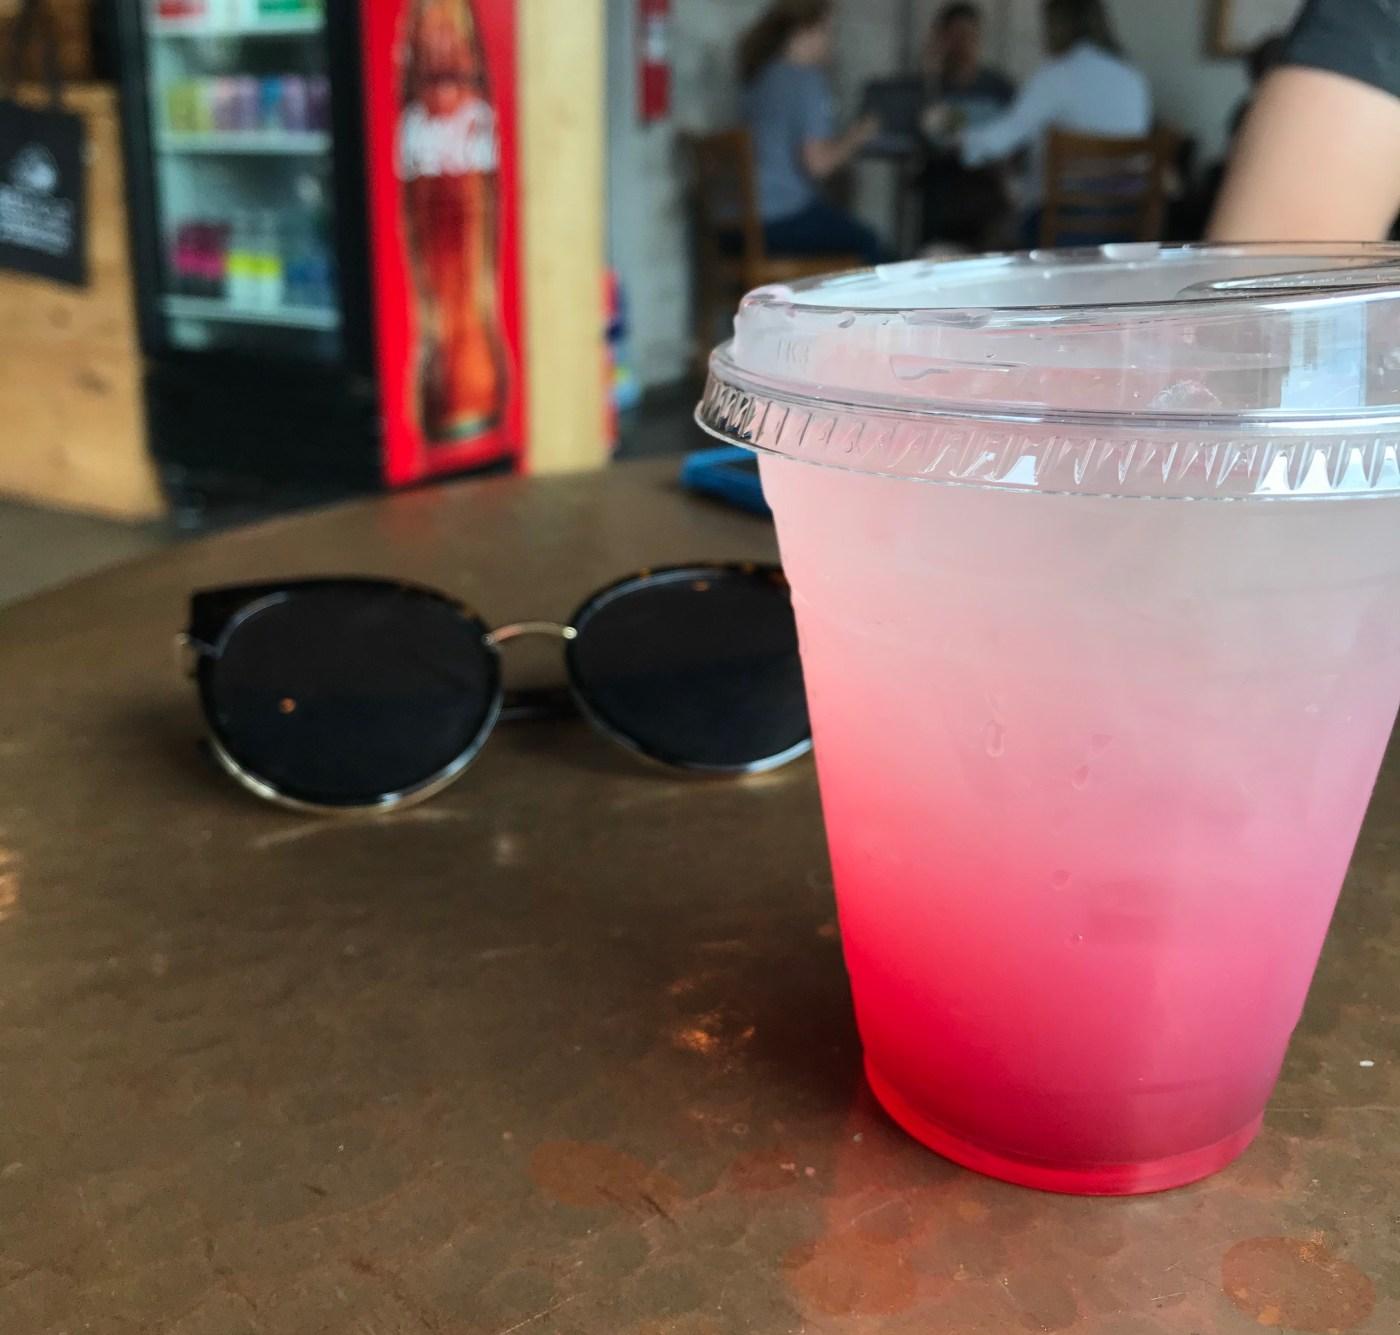 Dragonfruit lemonade from Red Cat Cafe